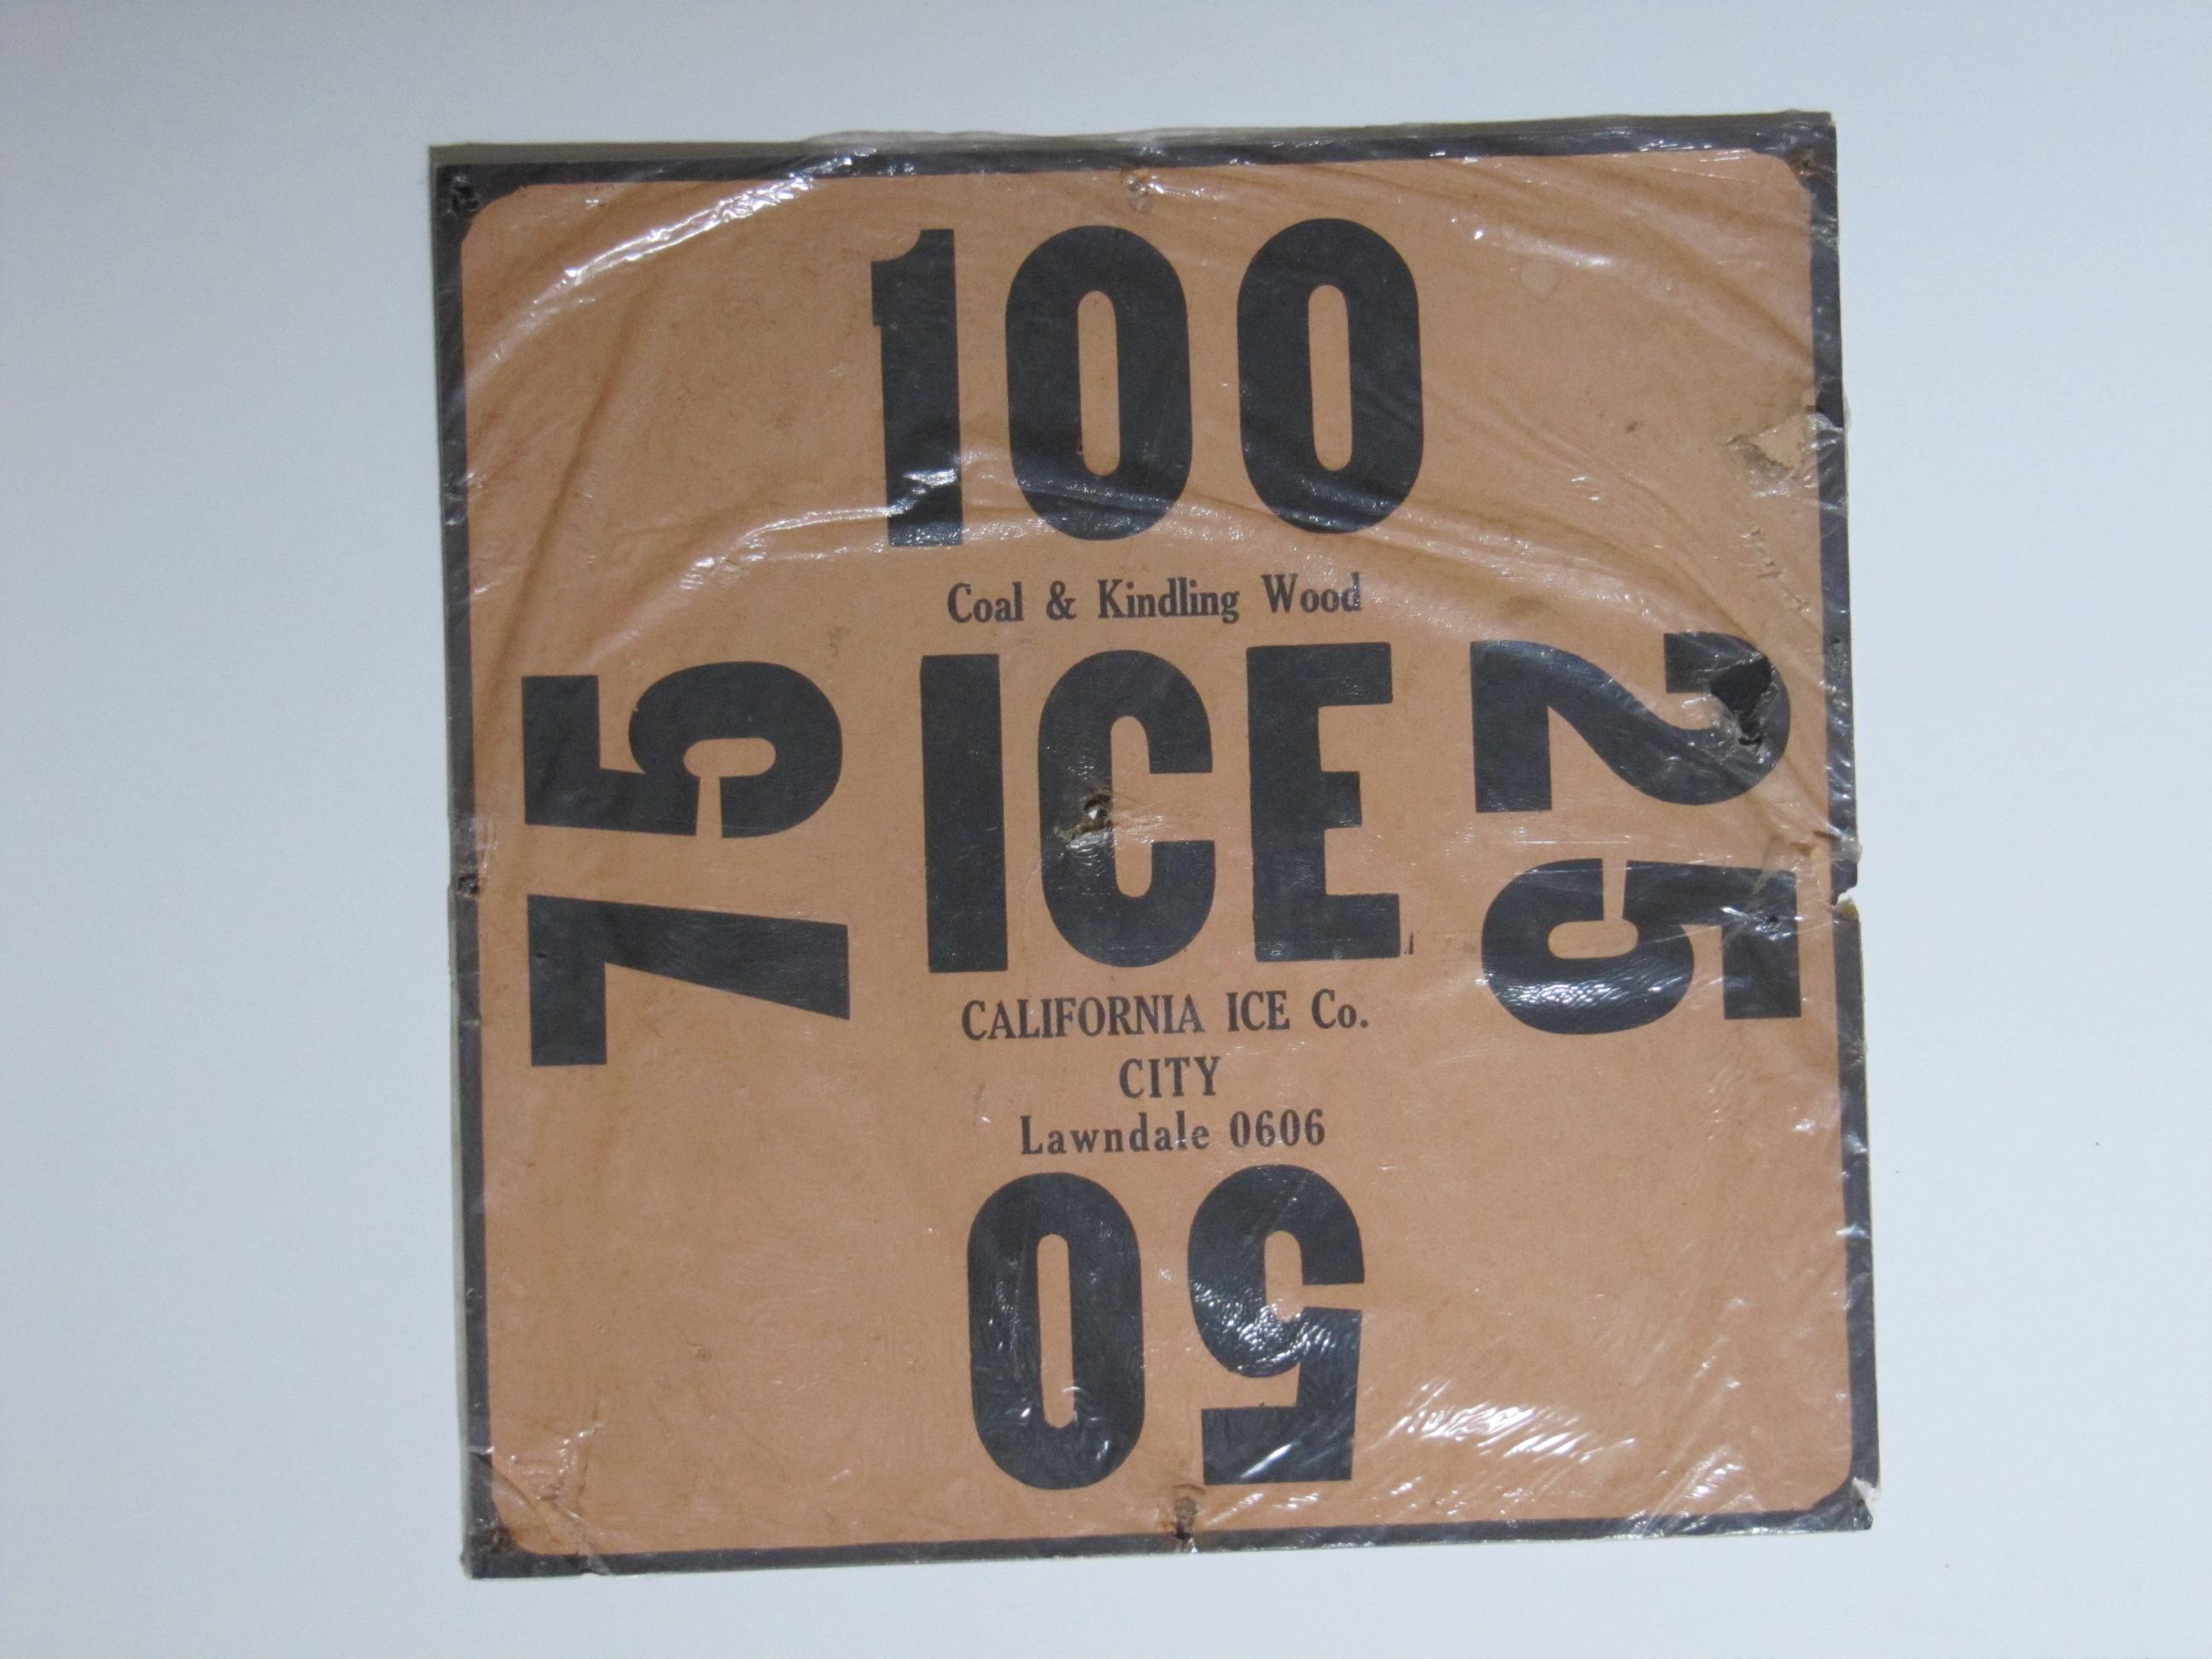 California Ice Co.